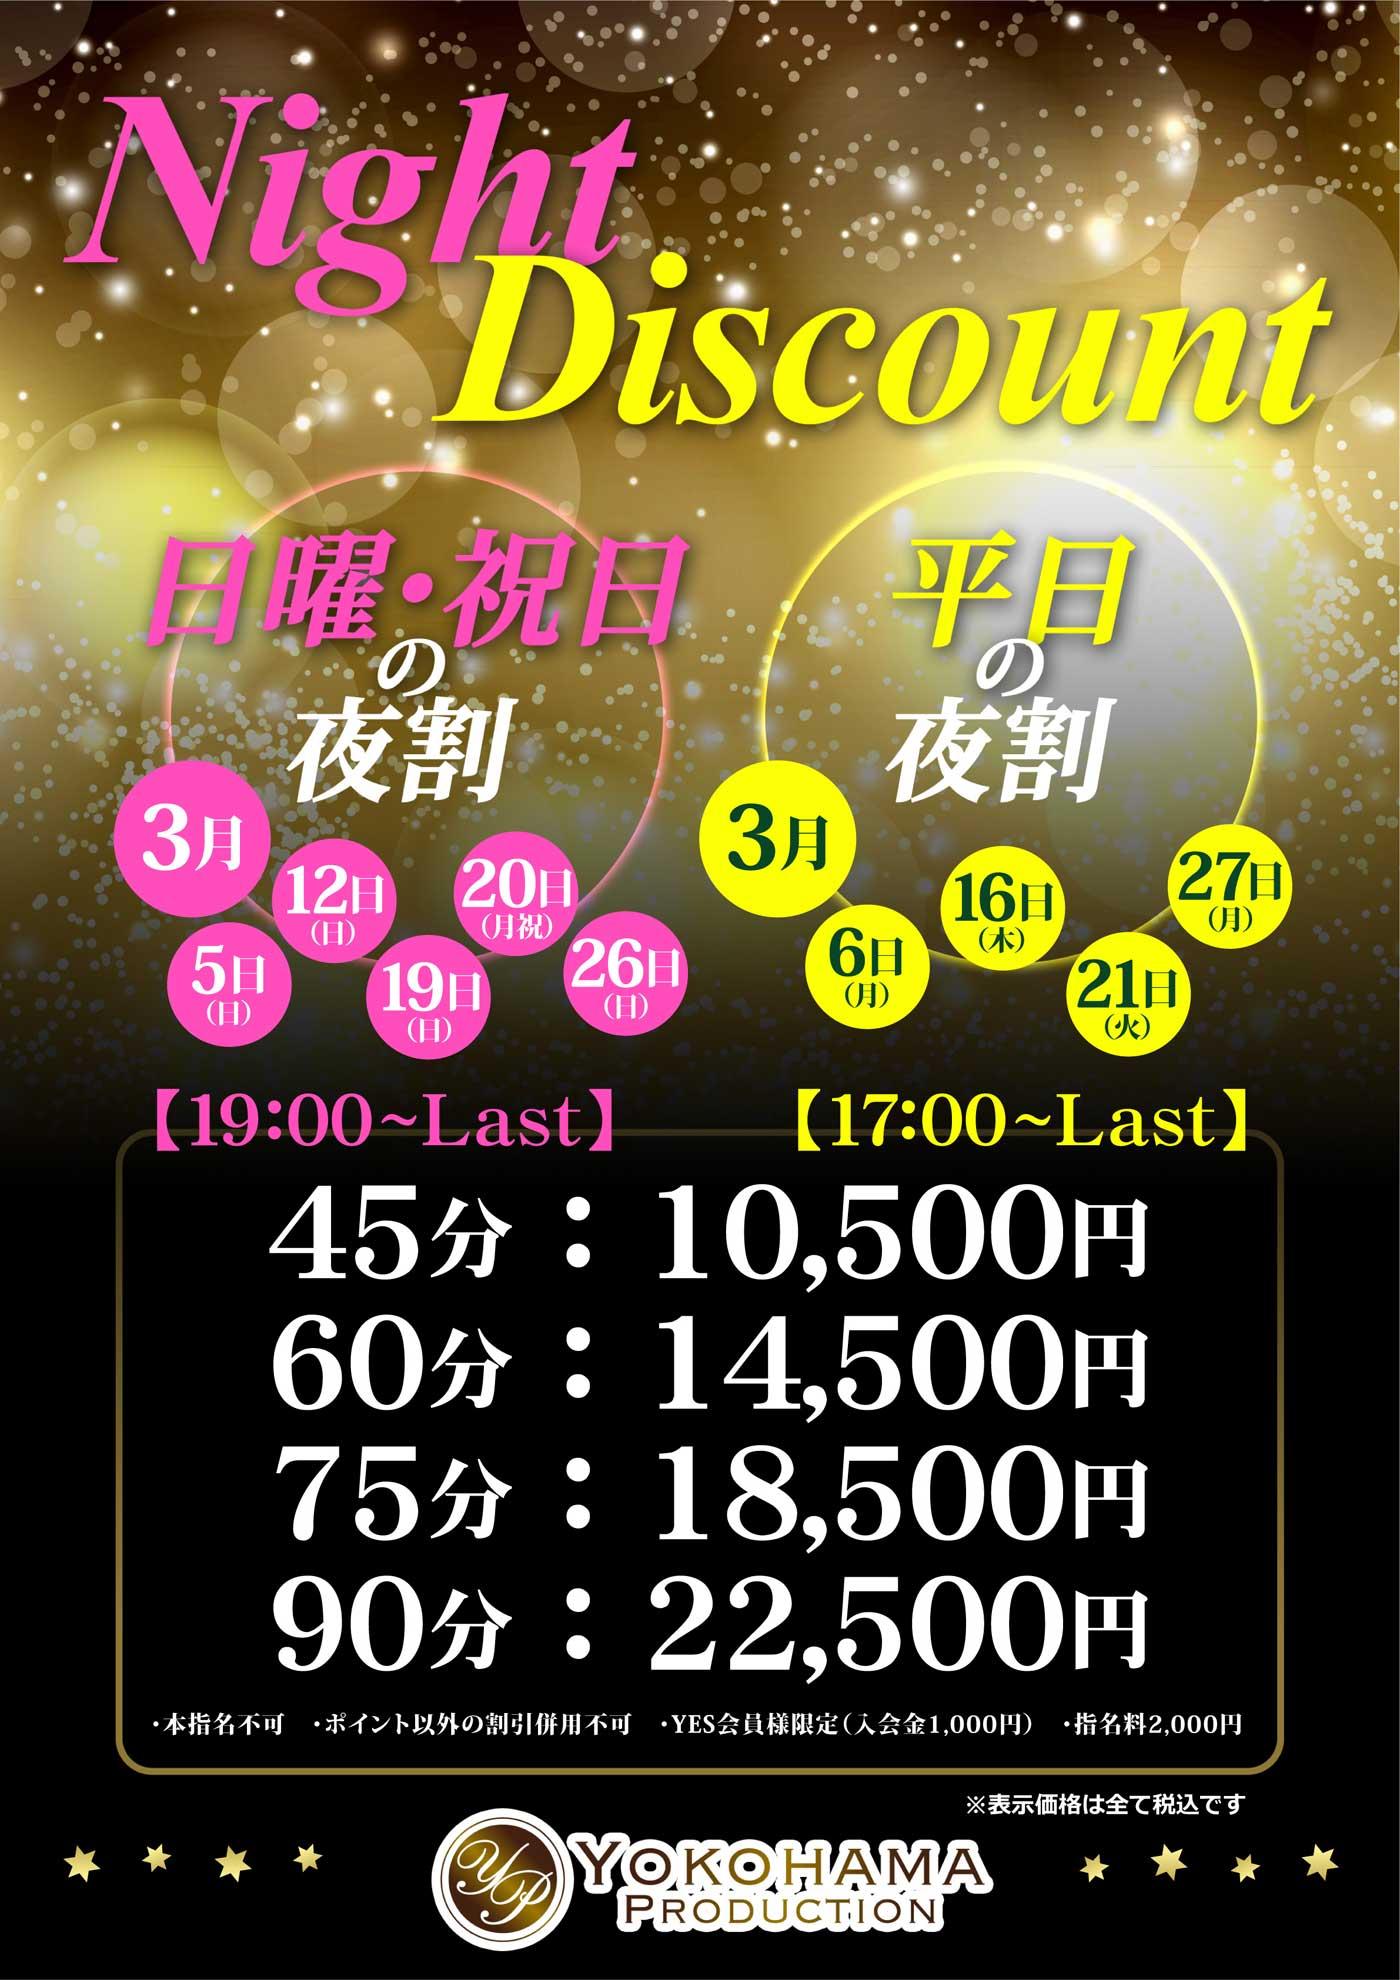 ★Night Discount~休日の夜割~★